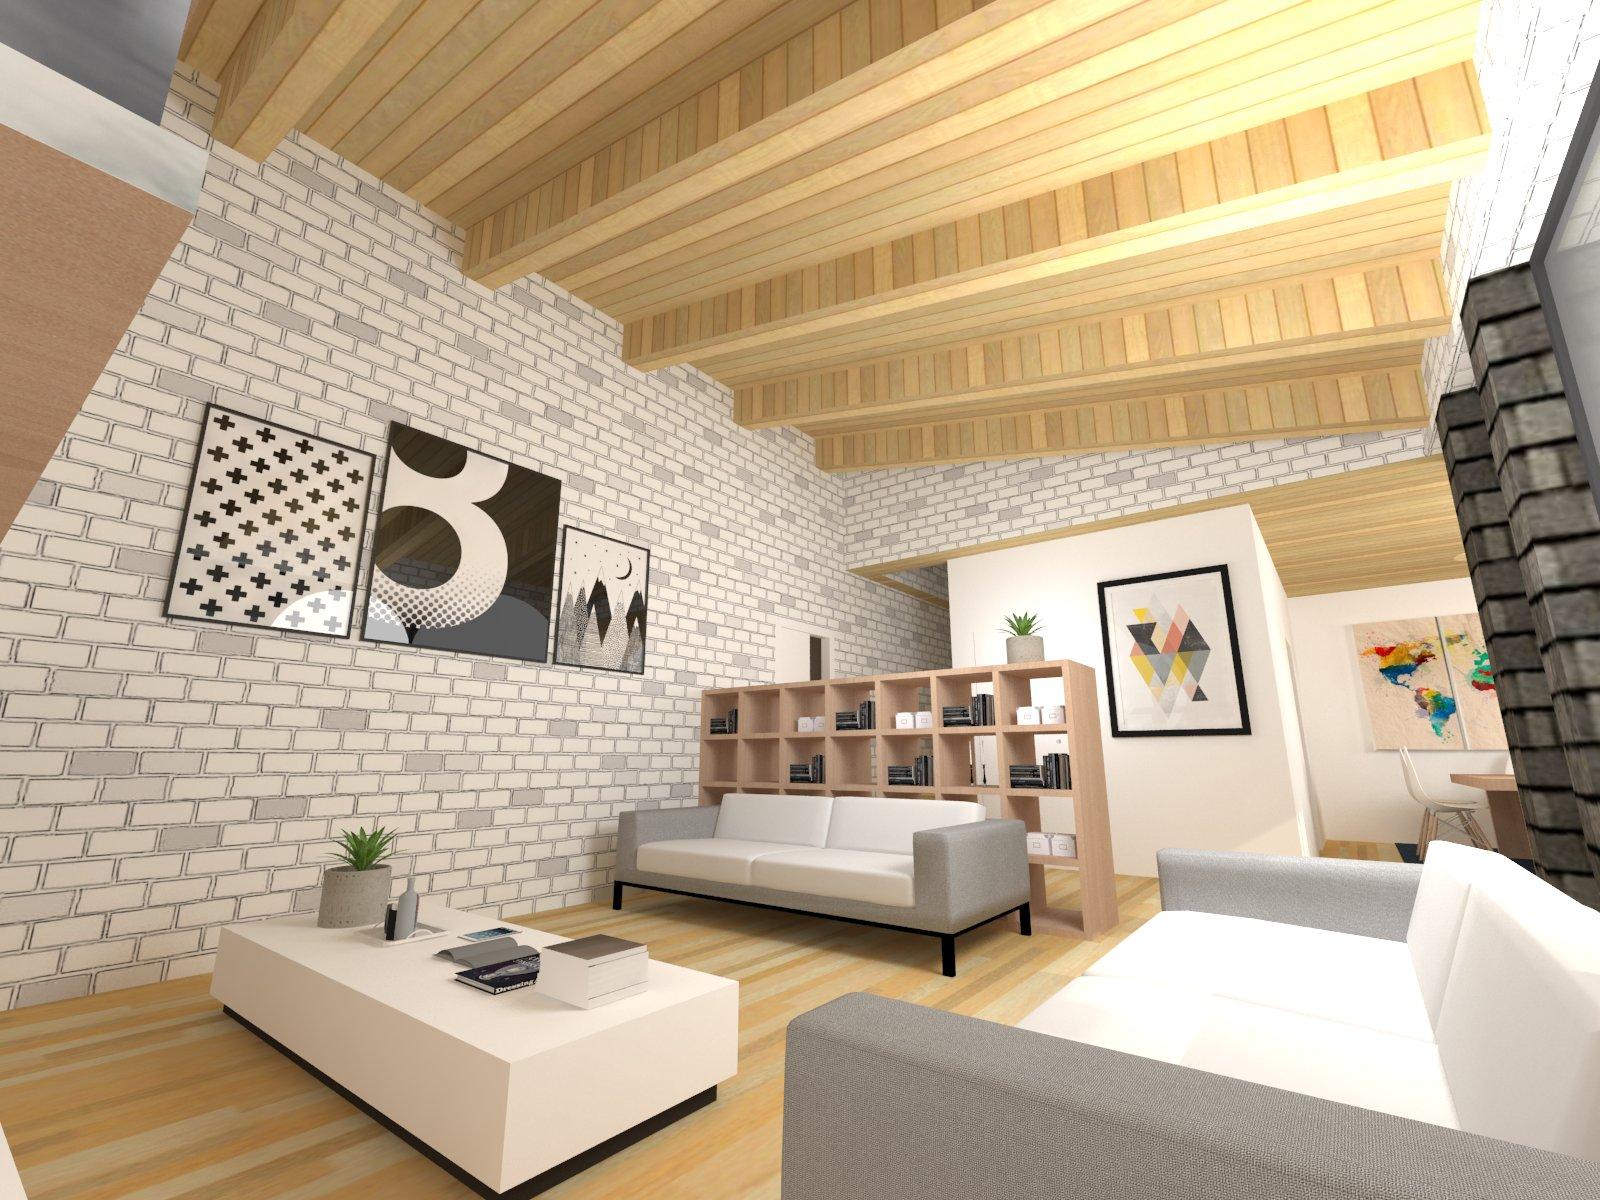 Vianarq estudio de arquitectura arquitecto en vitoria gasteiz alava - Arquitectos en vitoria ...